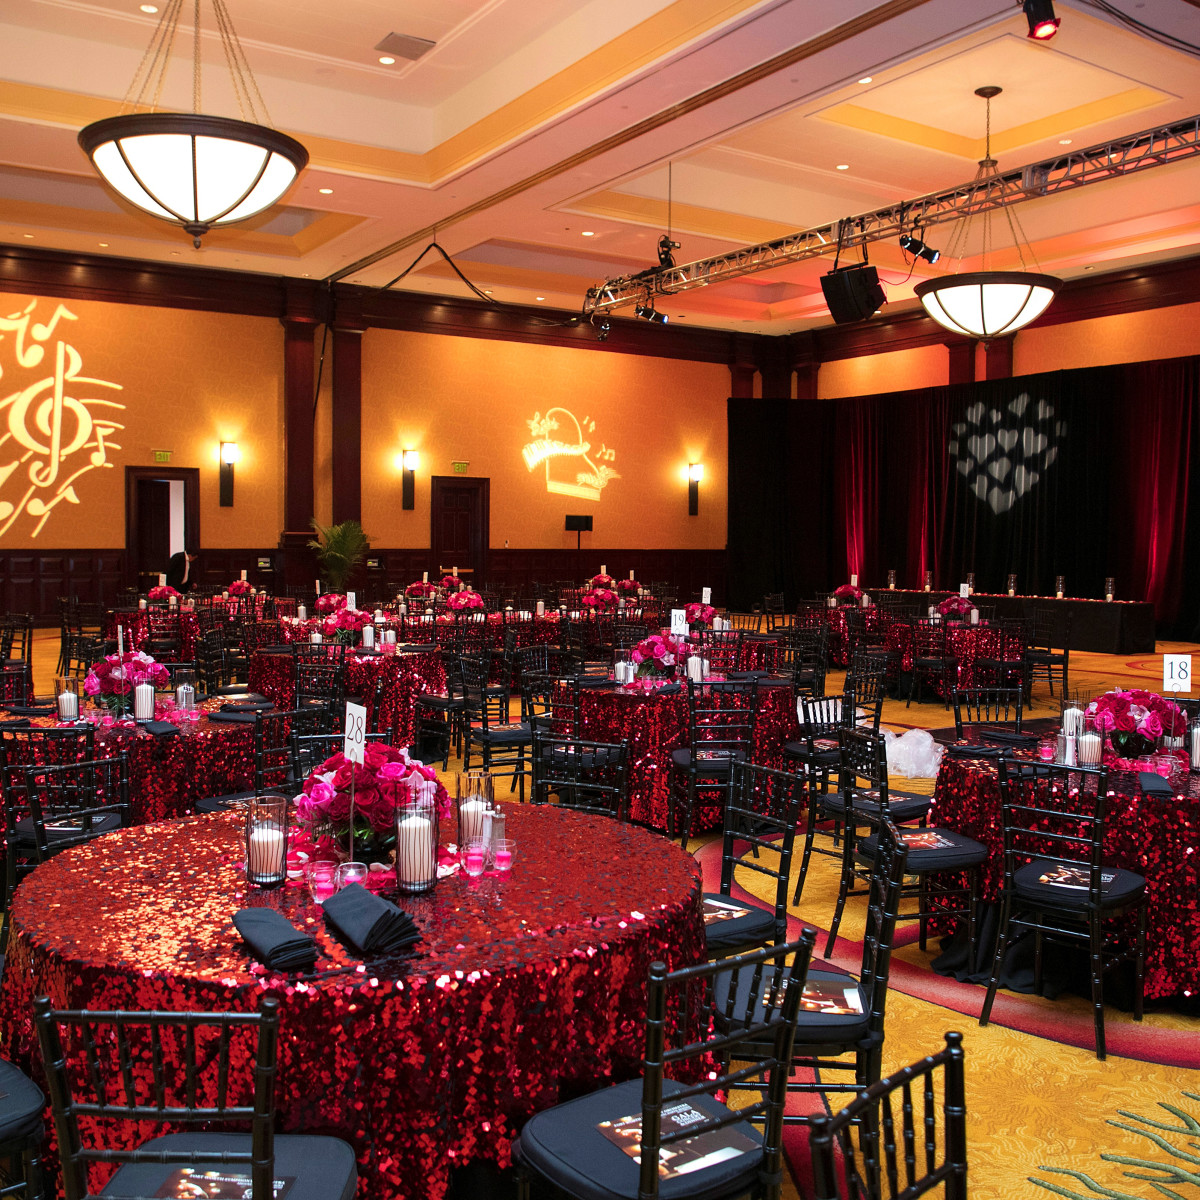 Renaissance Hotel ballroom, FW Symphony Gala 2018